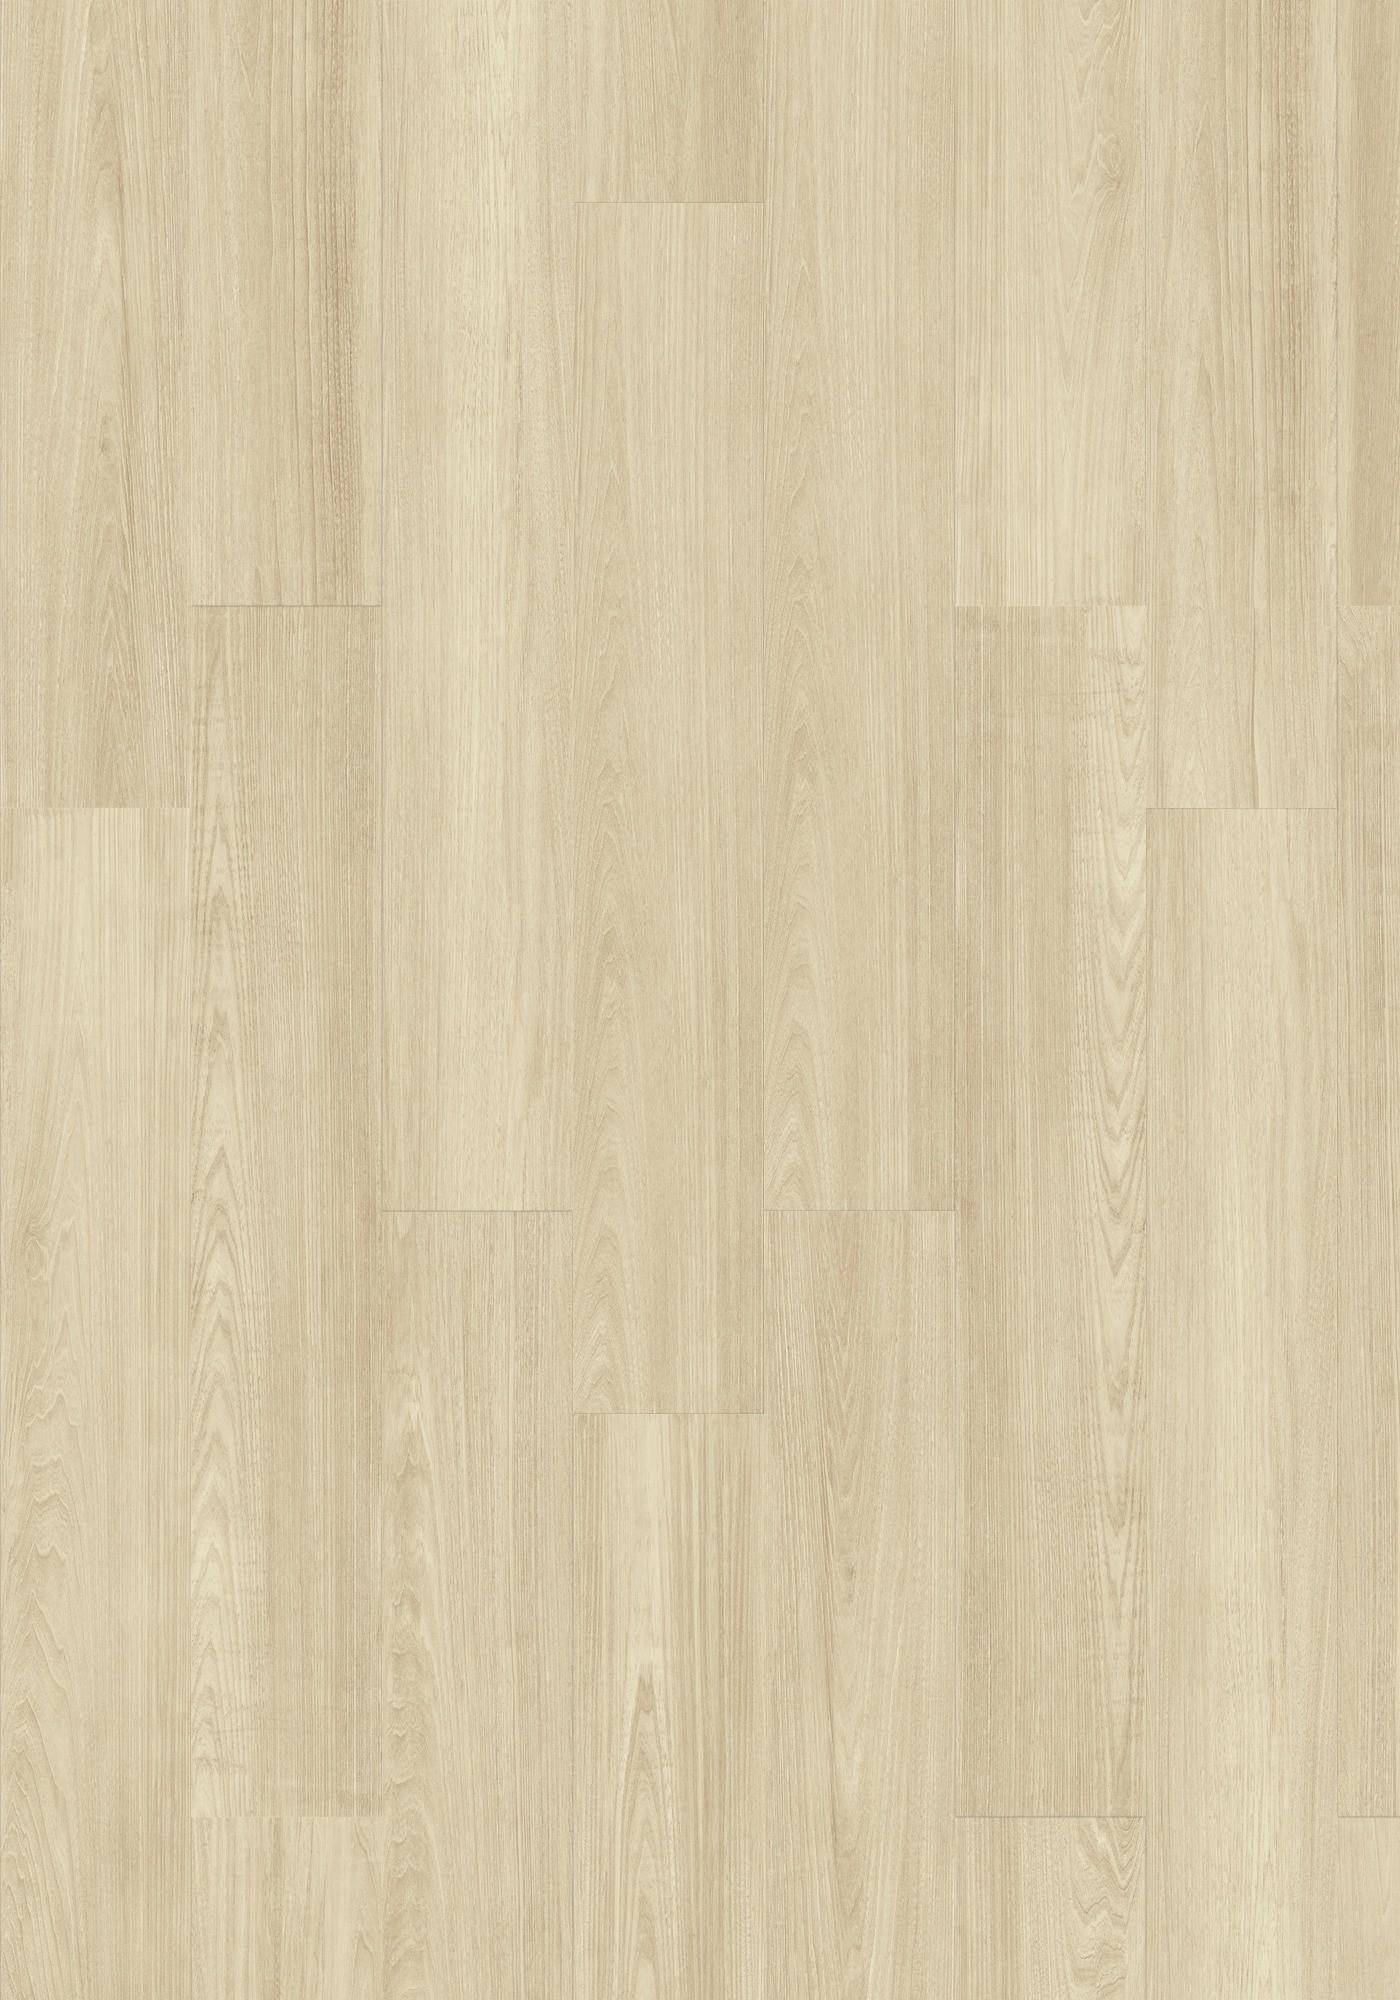 tarkett pvc click vinyl laminaat patina ash brown